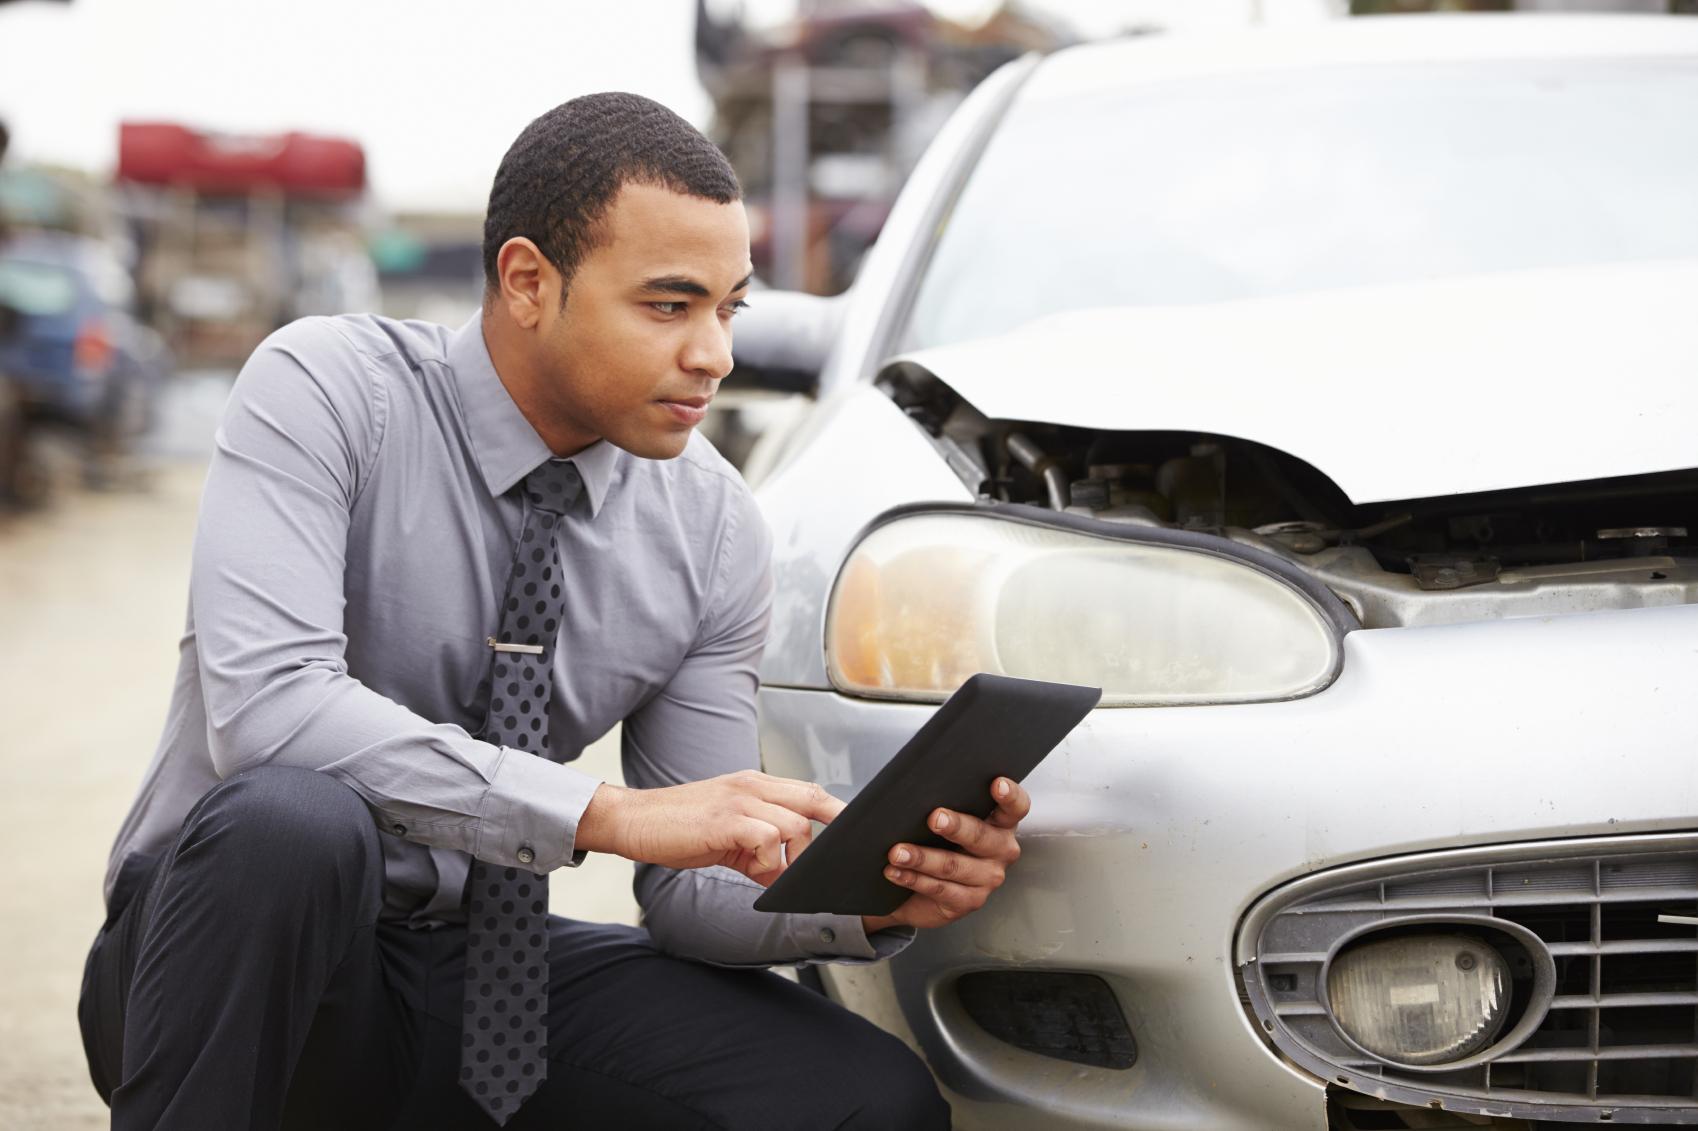 Loss Adjuster Using Digital Tablet In Car Wreck Inspection